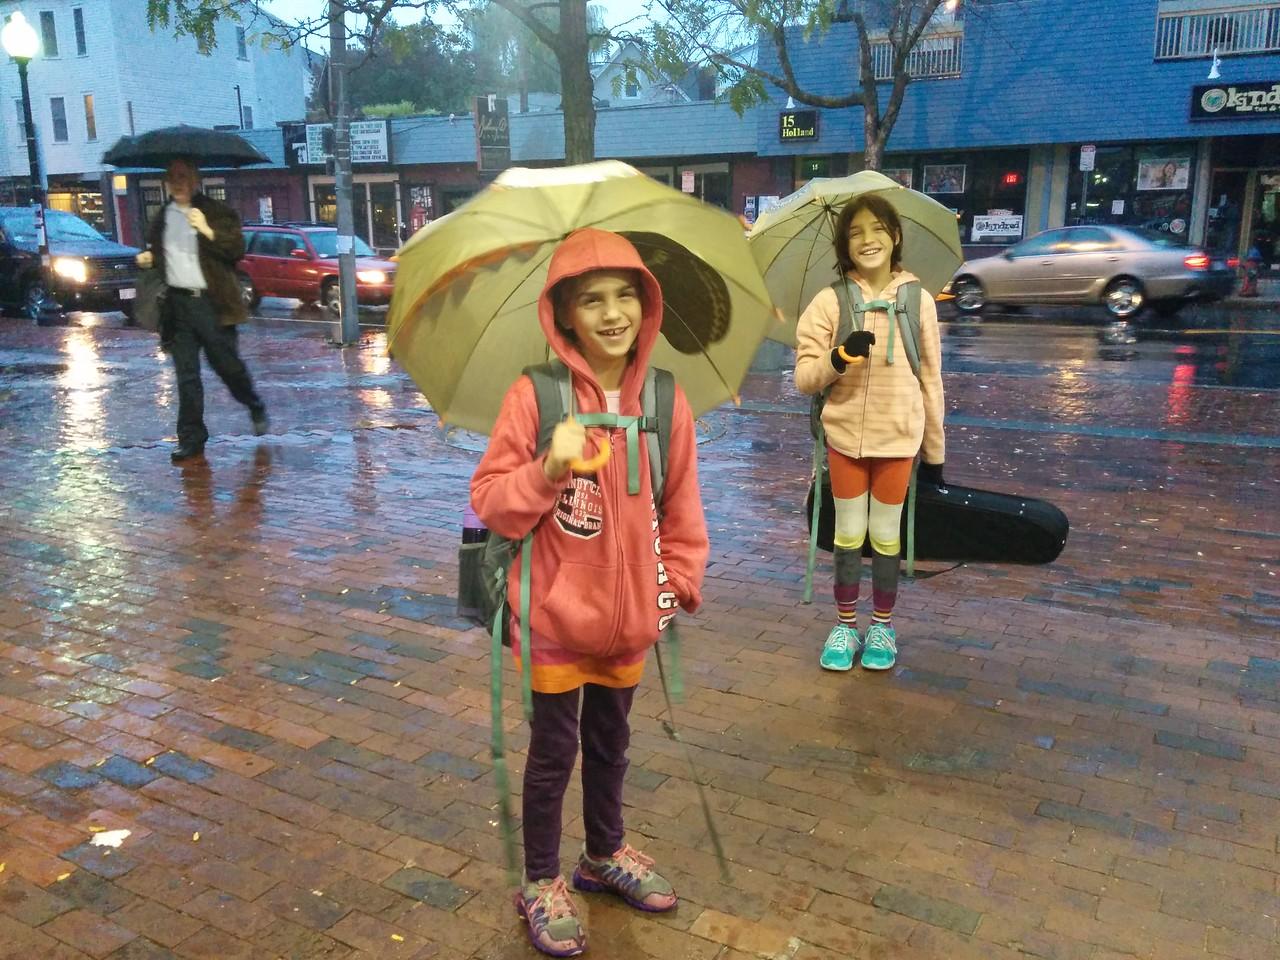 Rain on the w